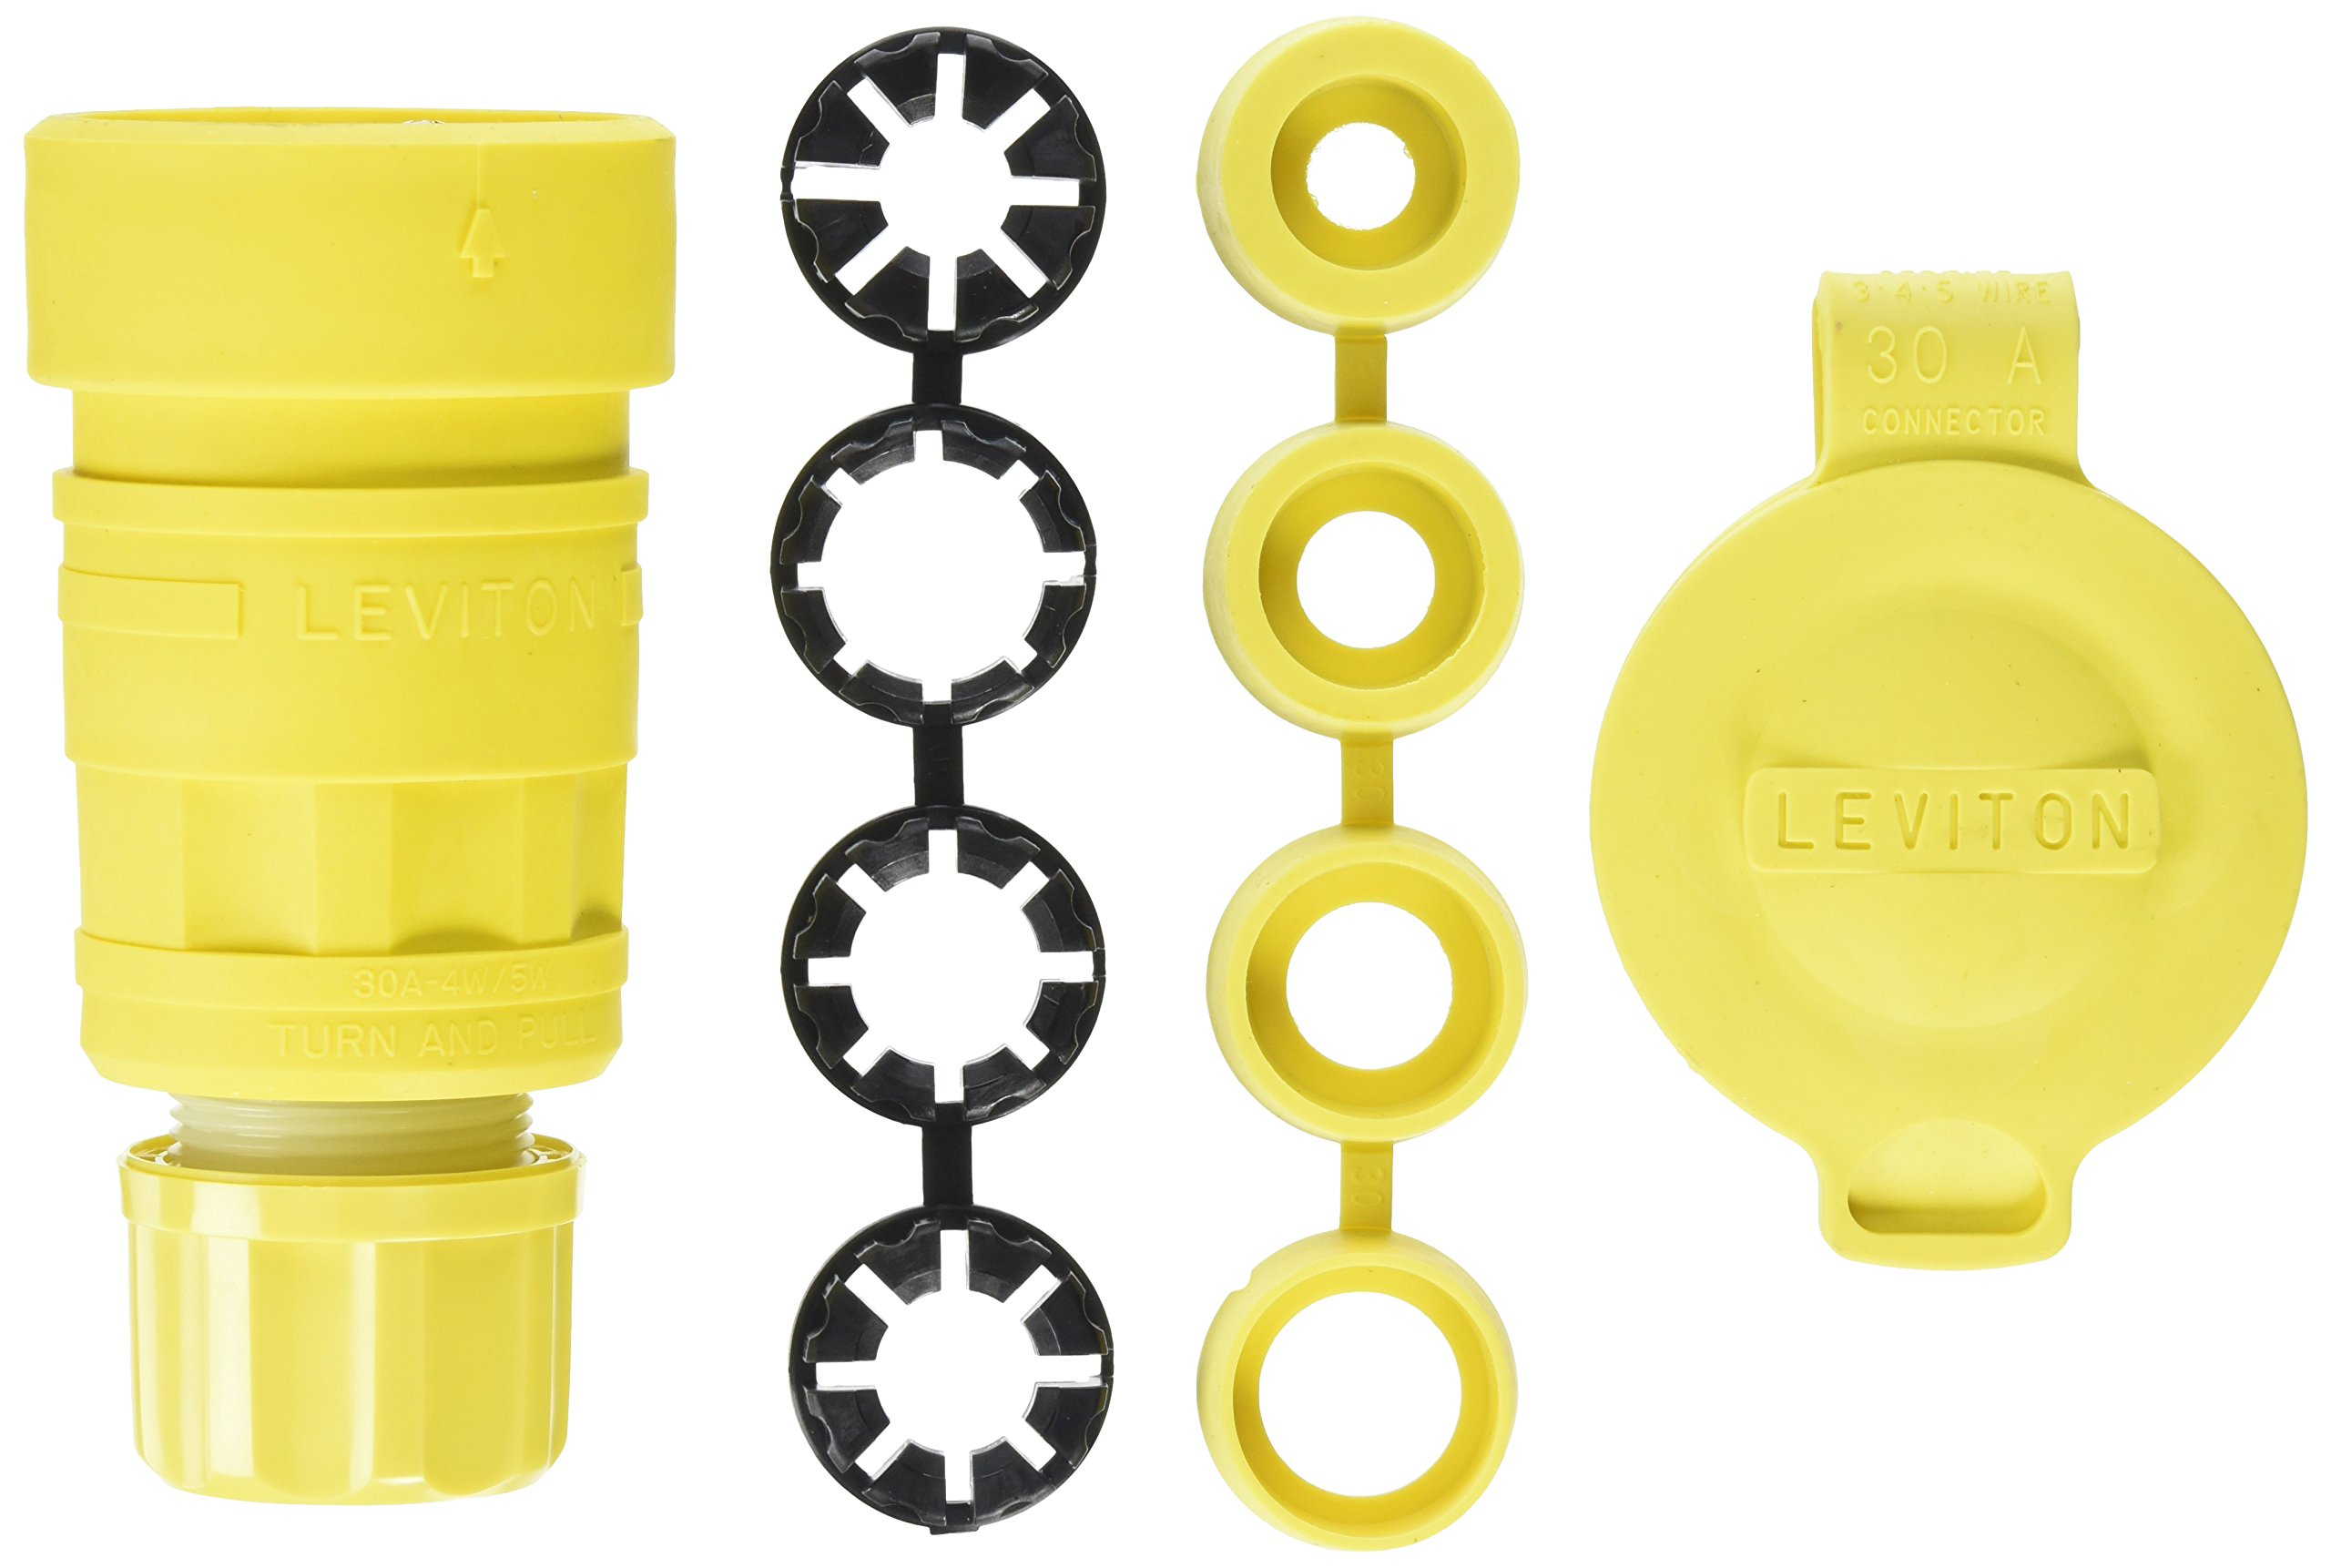 Leviton 29W81 30-Amp, 120/208-Volt 3PY, NEMA L21-30R, 4P, 5W, Locking Connector, Industrial Grade, Grounding, Wetguard, Yellow